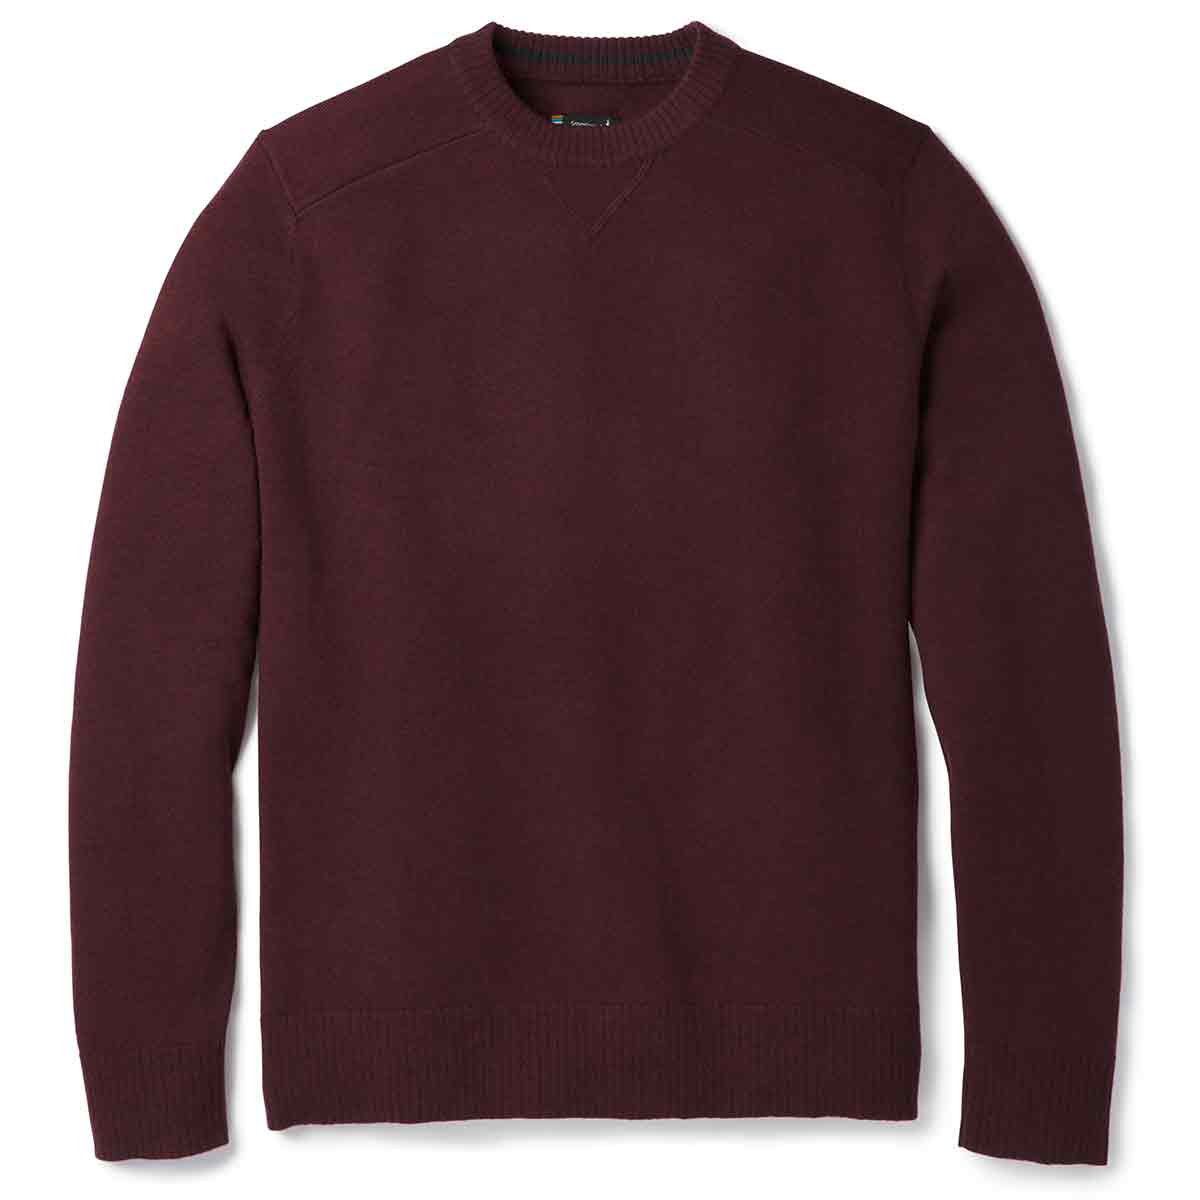 Smartwool Men's Sparwood Crew Sweater - Purple, L